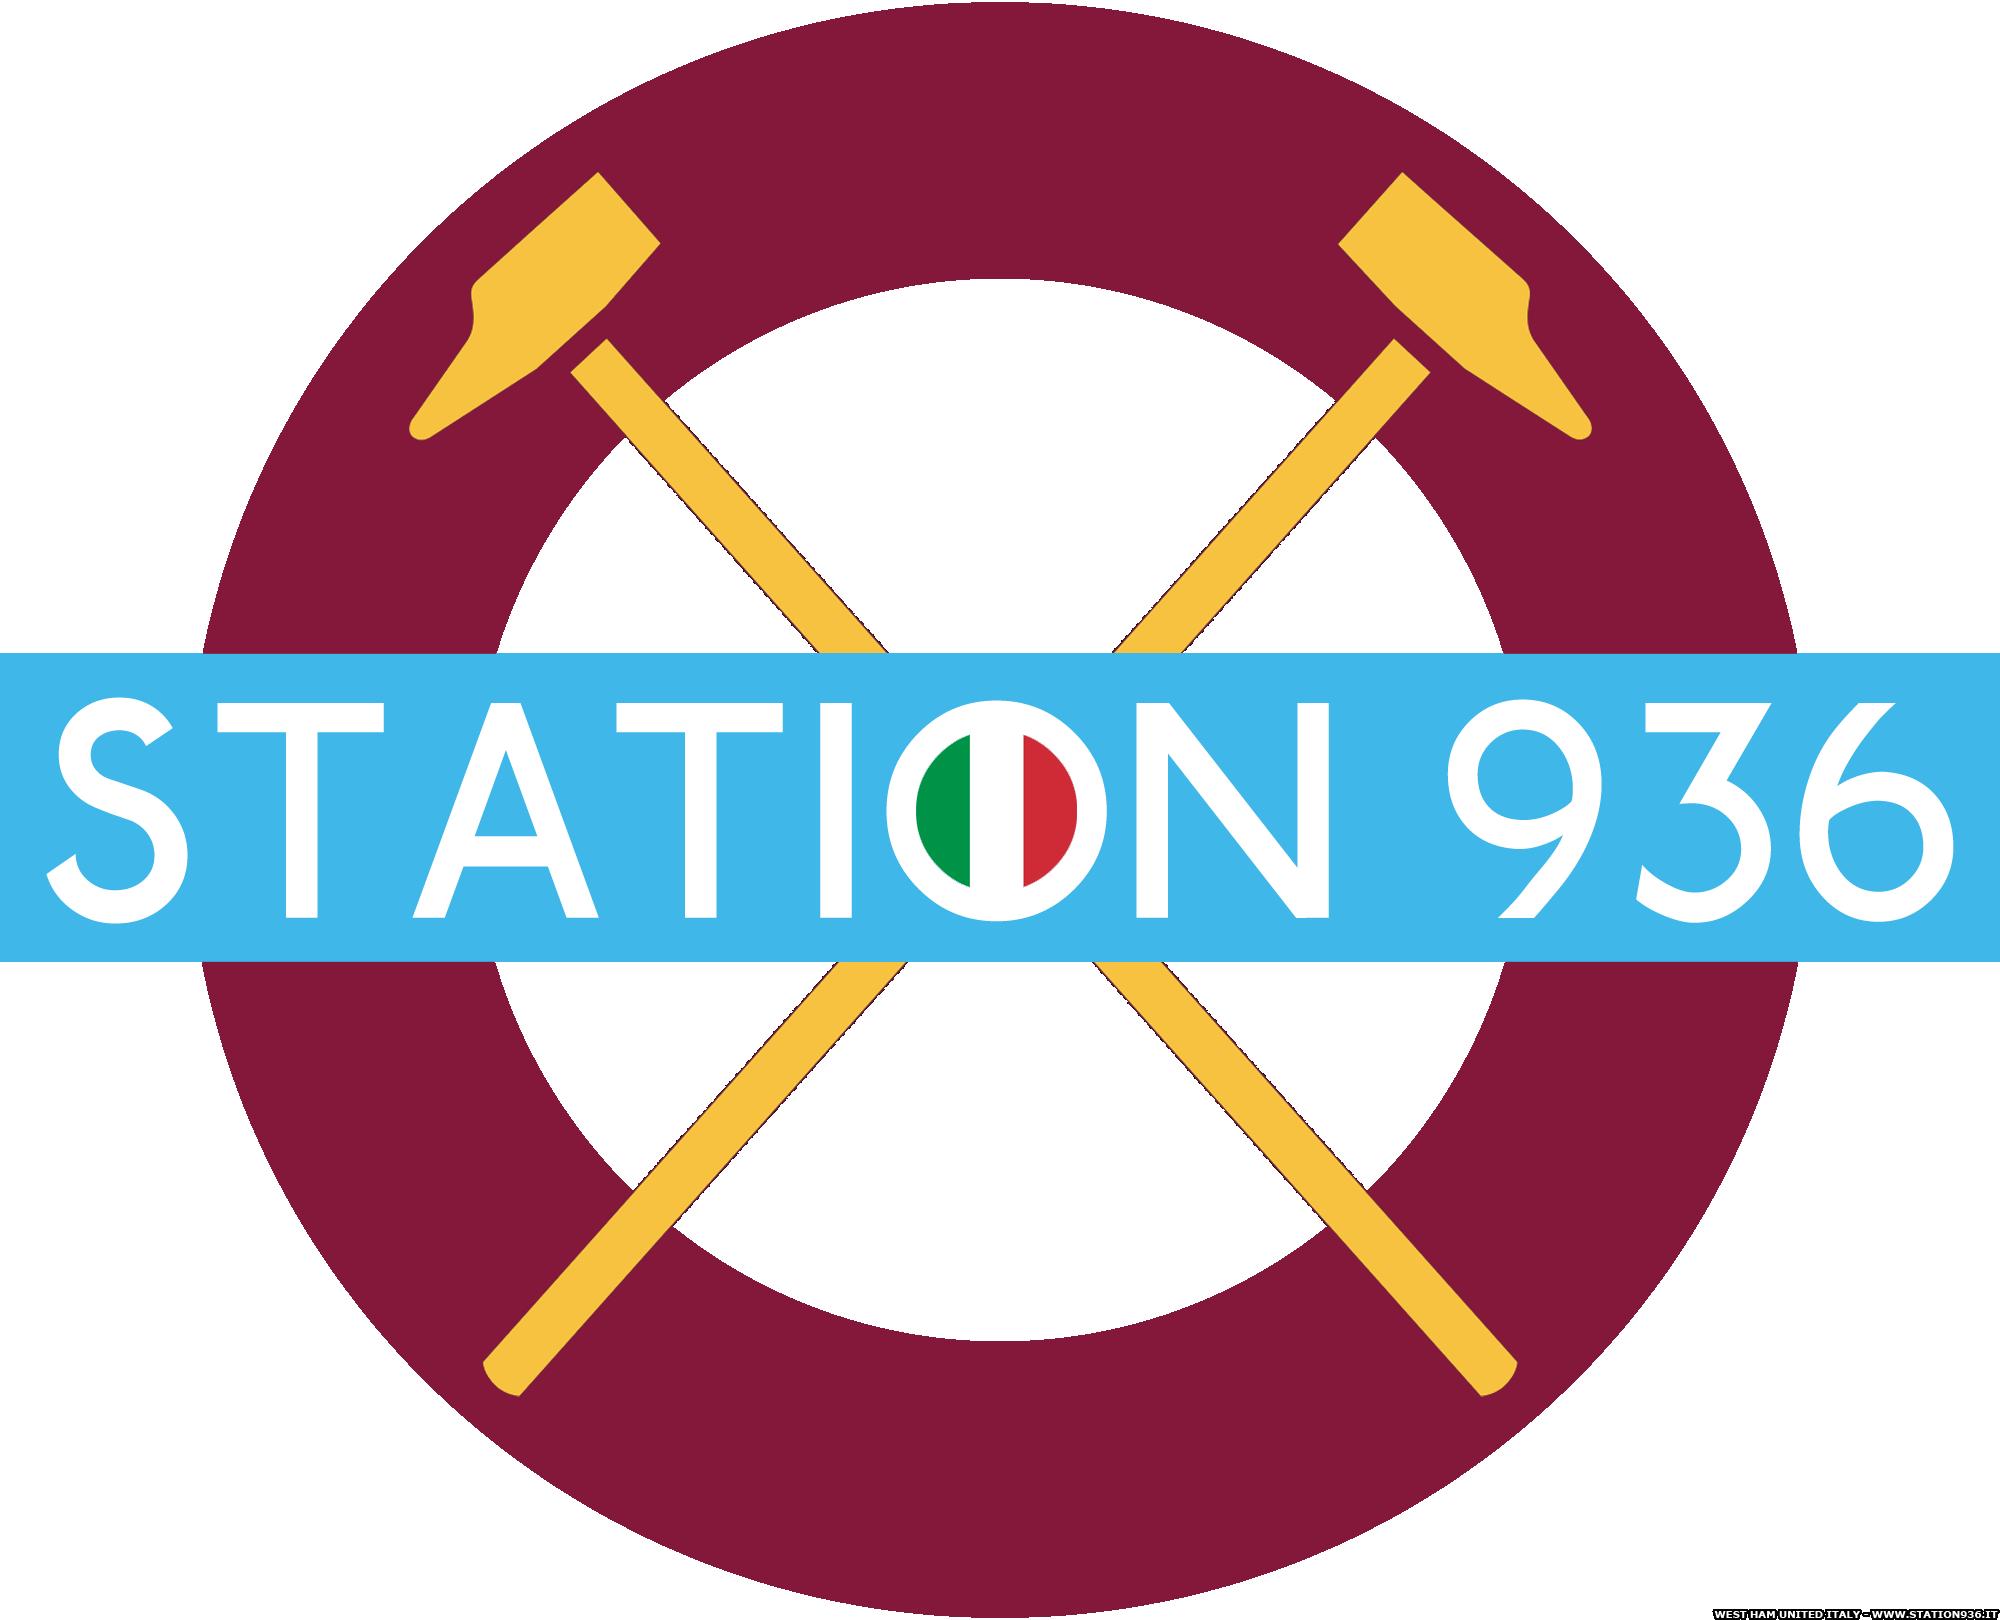 Logo Station 936 West Ham United Italia versione tricolore